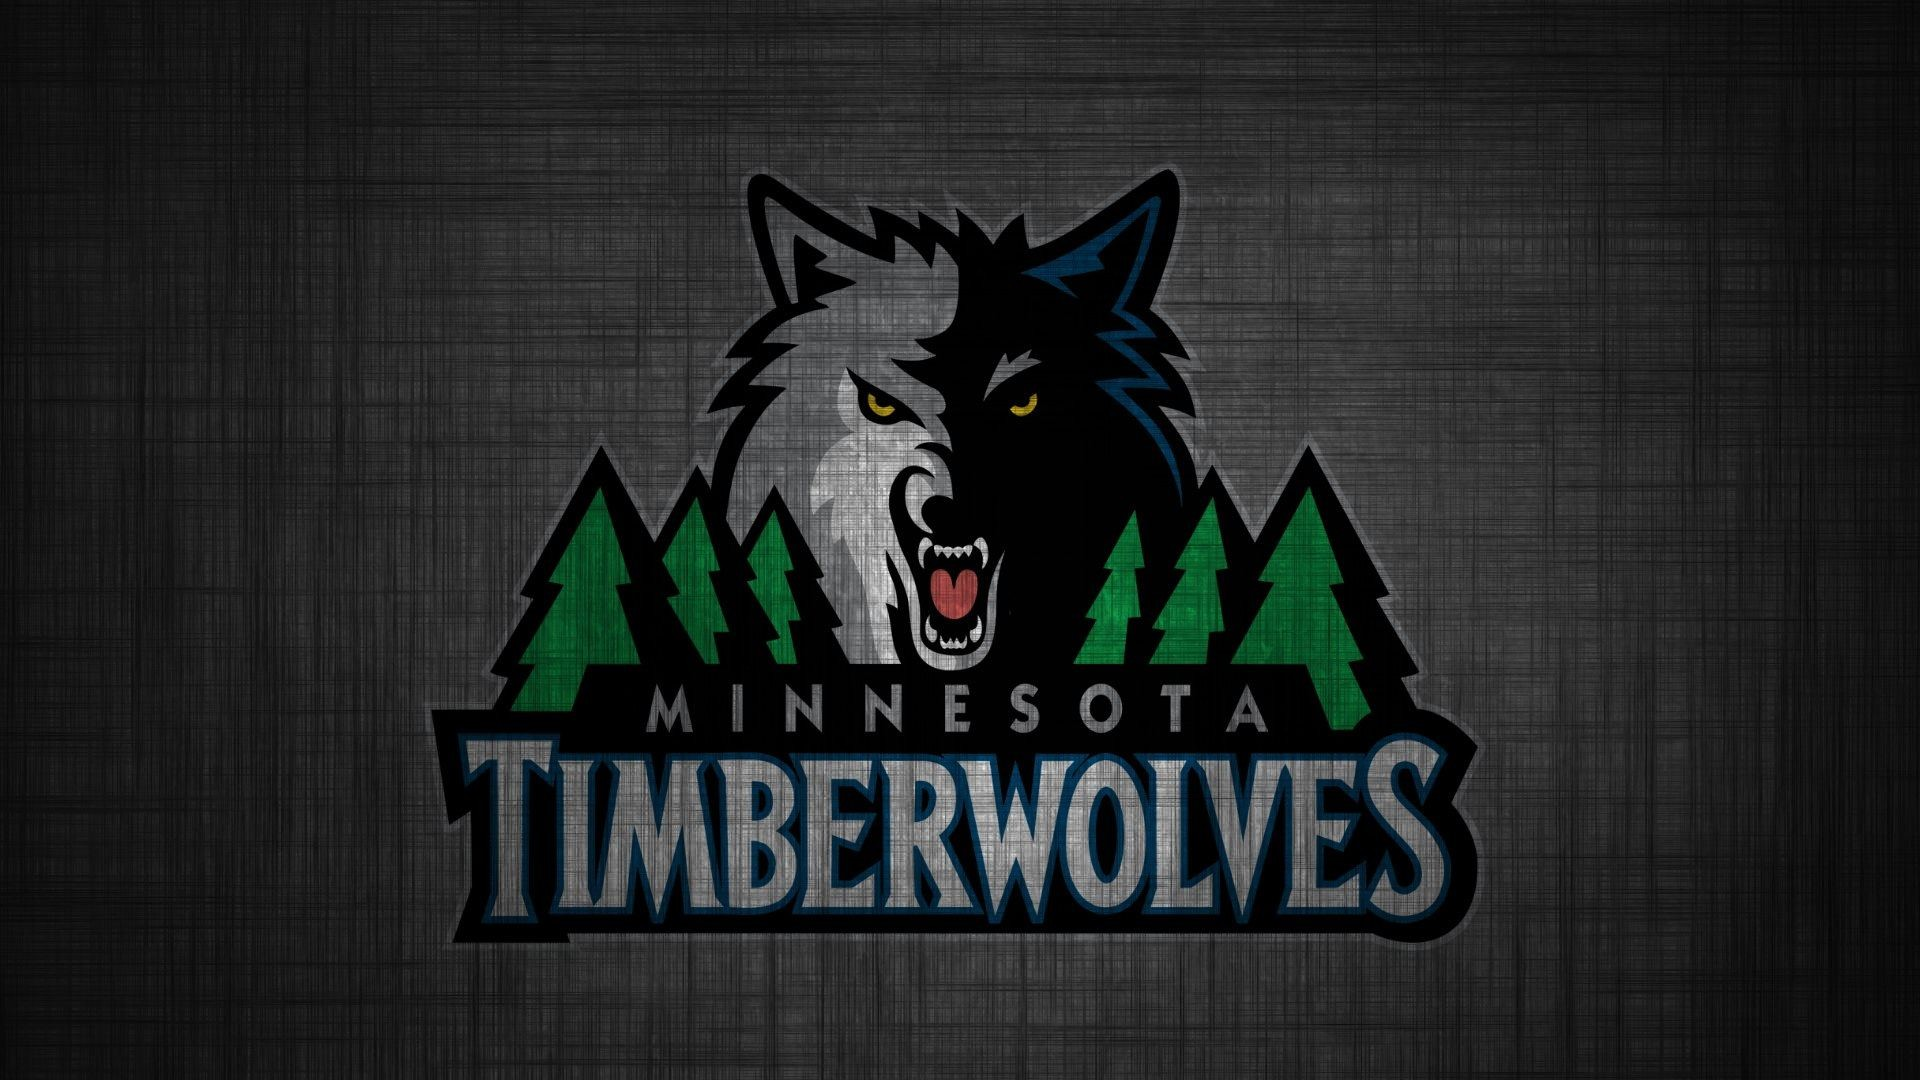 Minnesota Timberwolves wallpaper hd free download